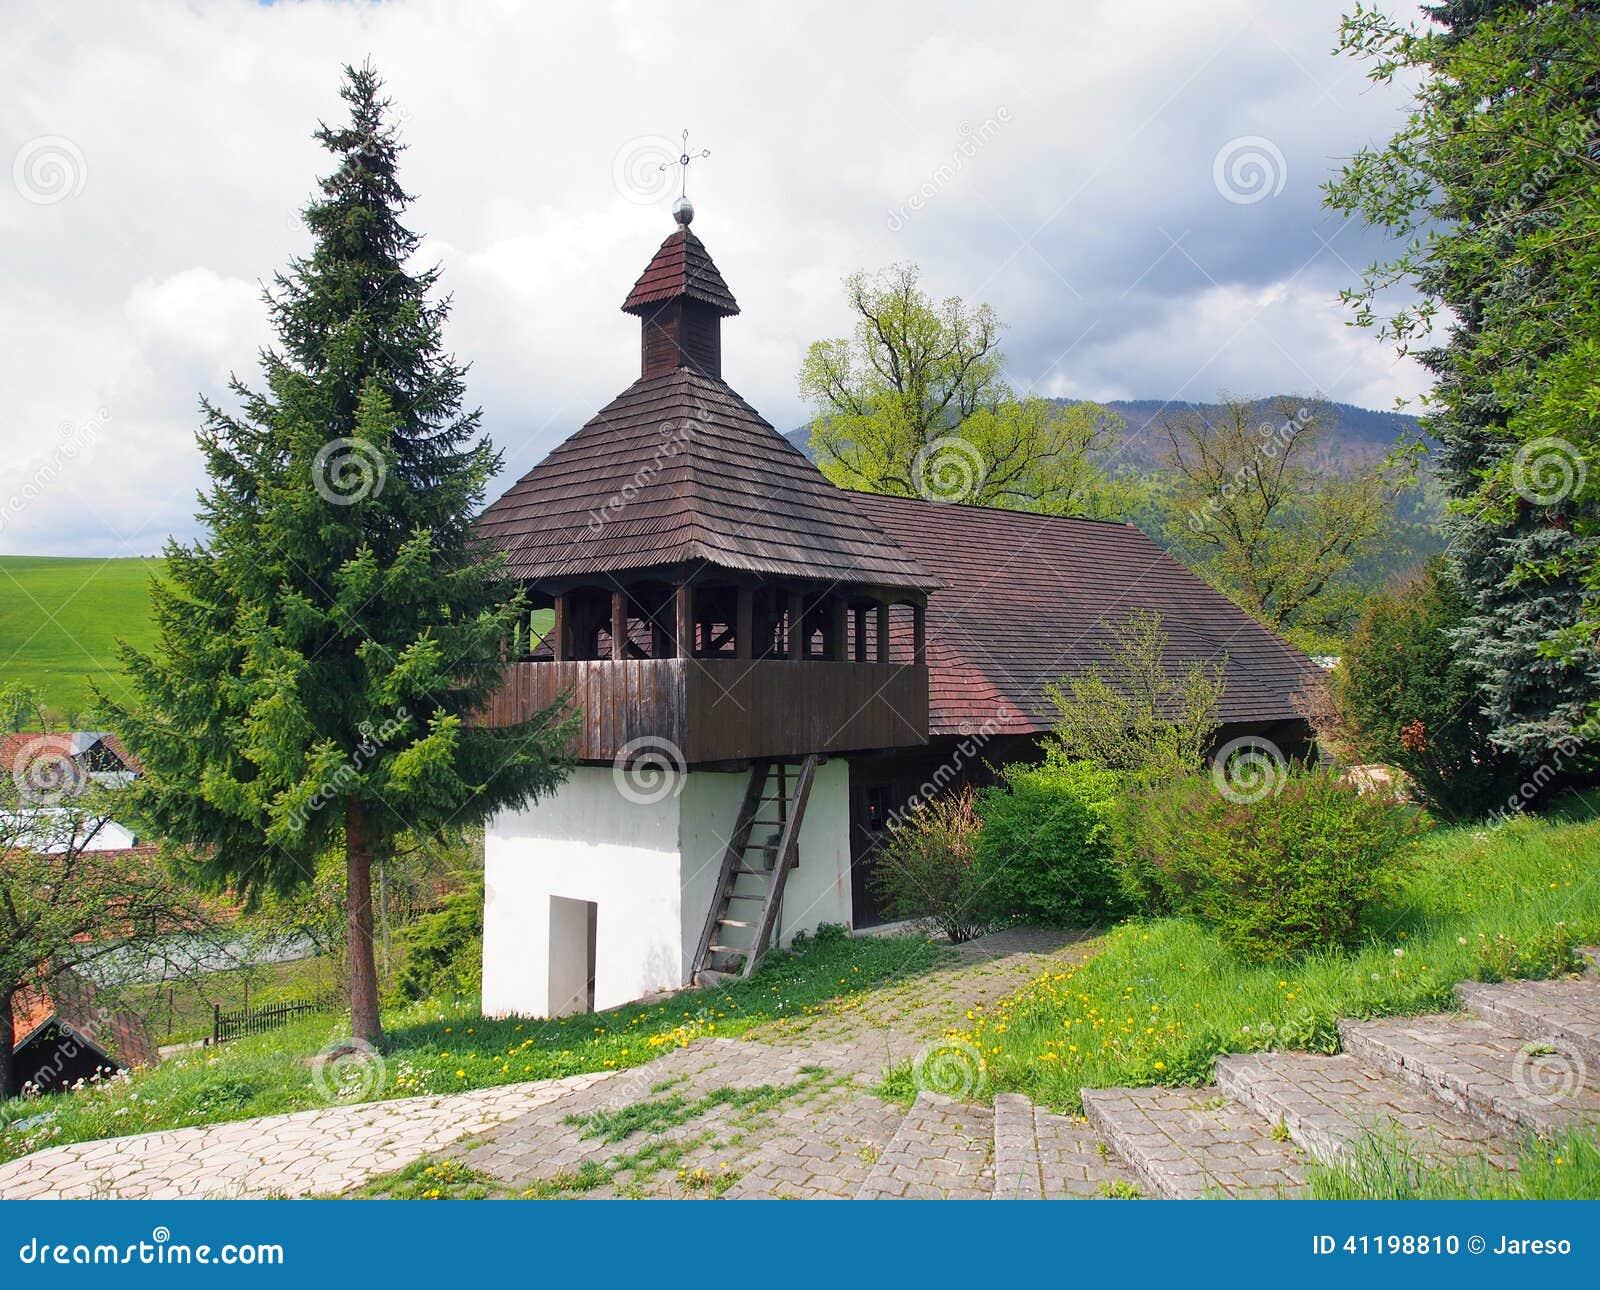 Lutheran church in Istebne village, Slovakia.